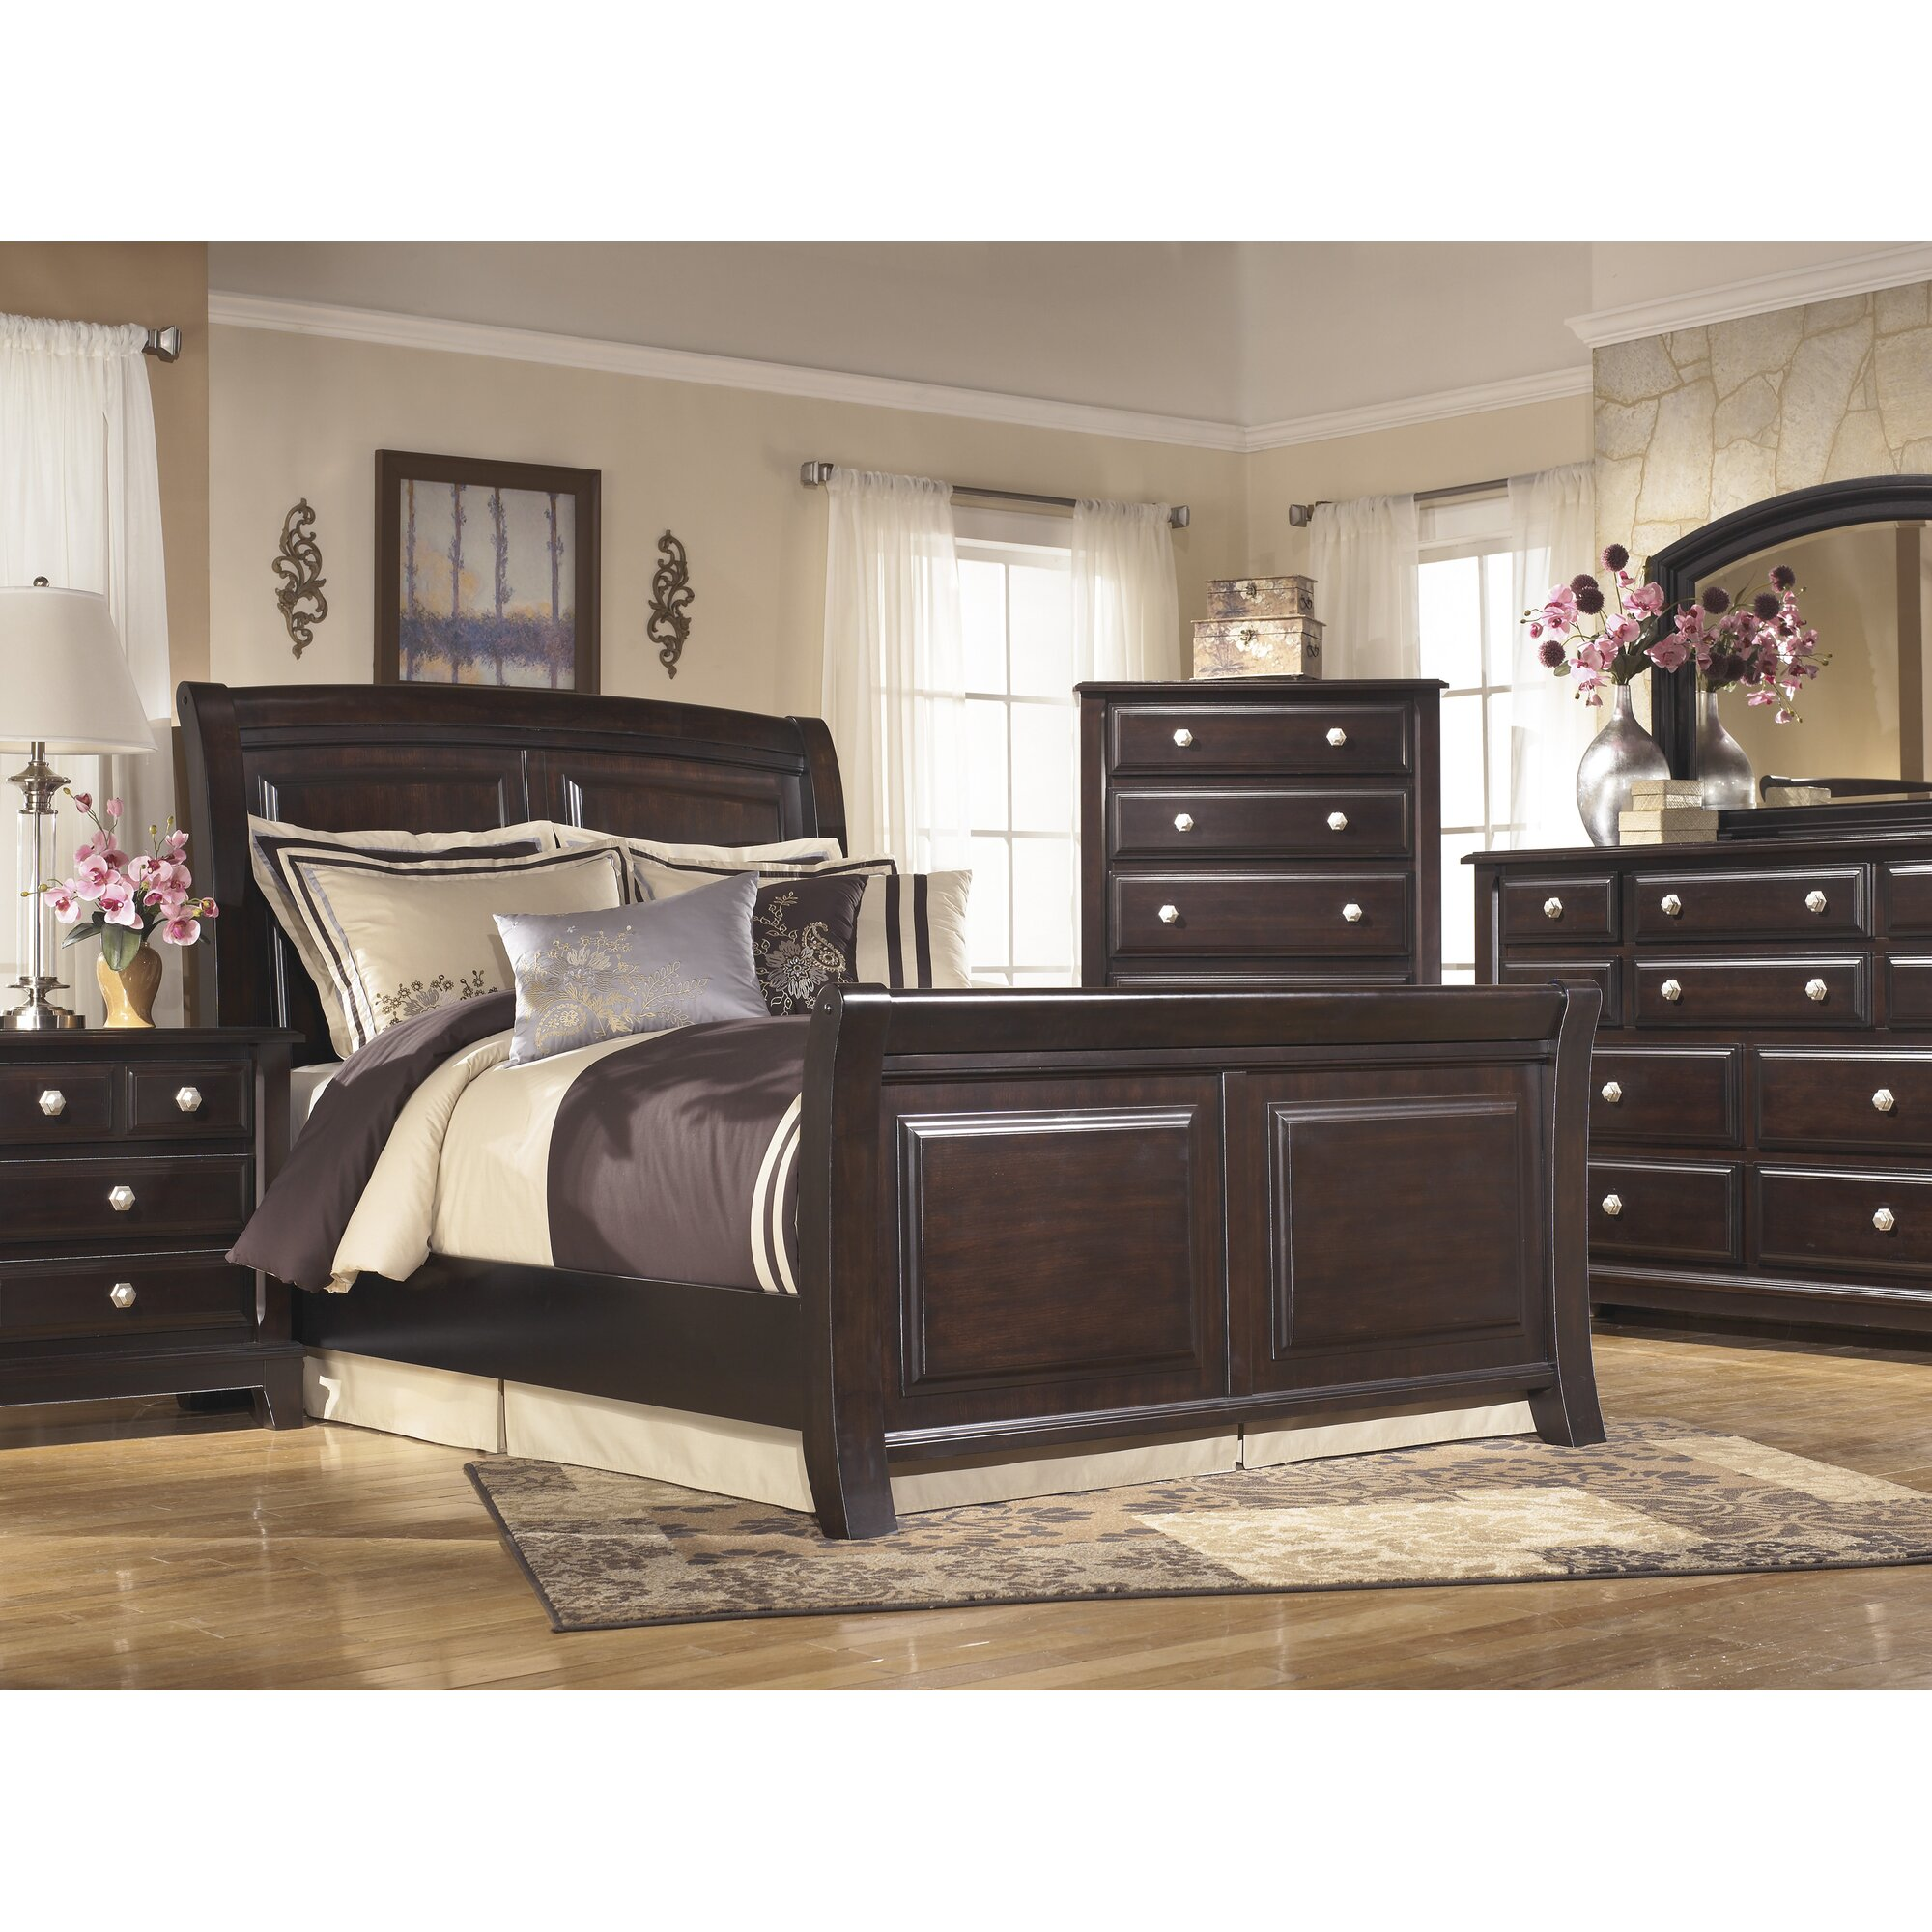 Signature design by ashley ridgley sleigh customizable - Ashley furniture sleigh bedroom set ...